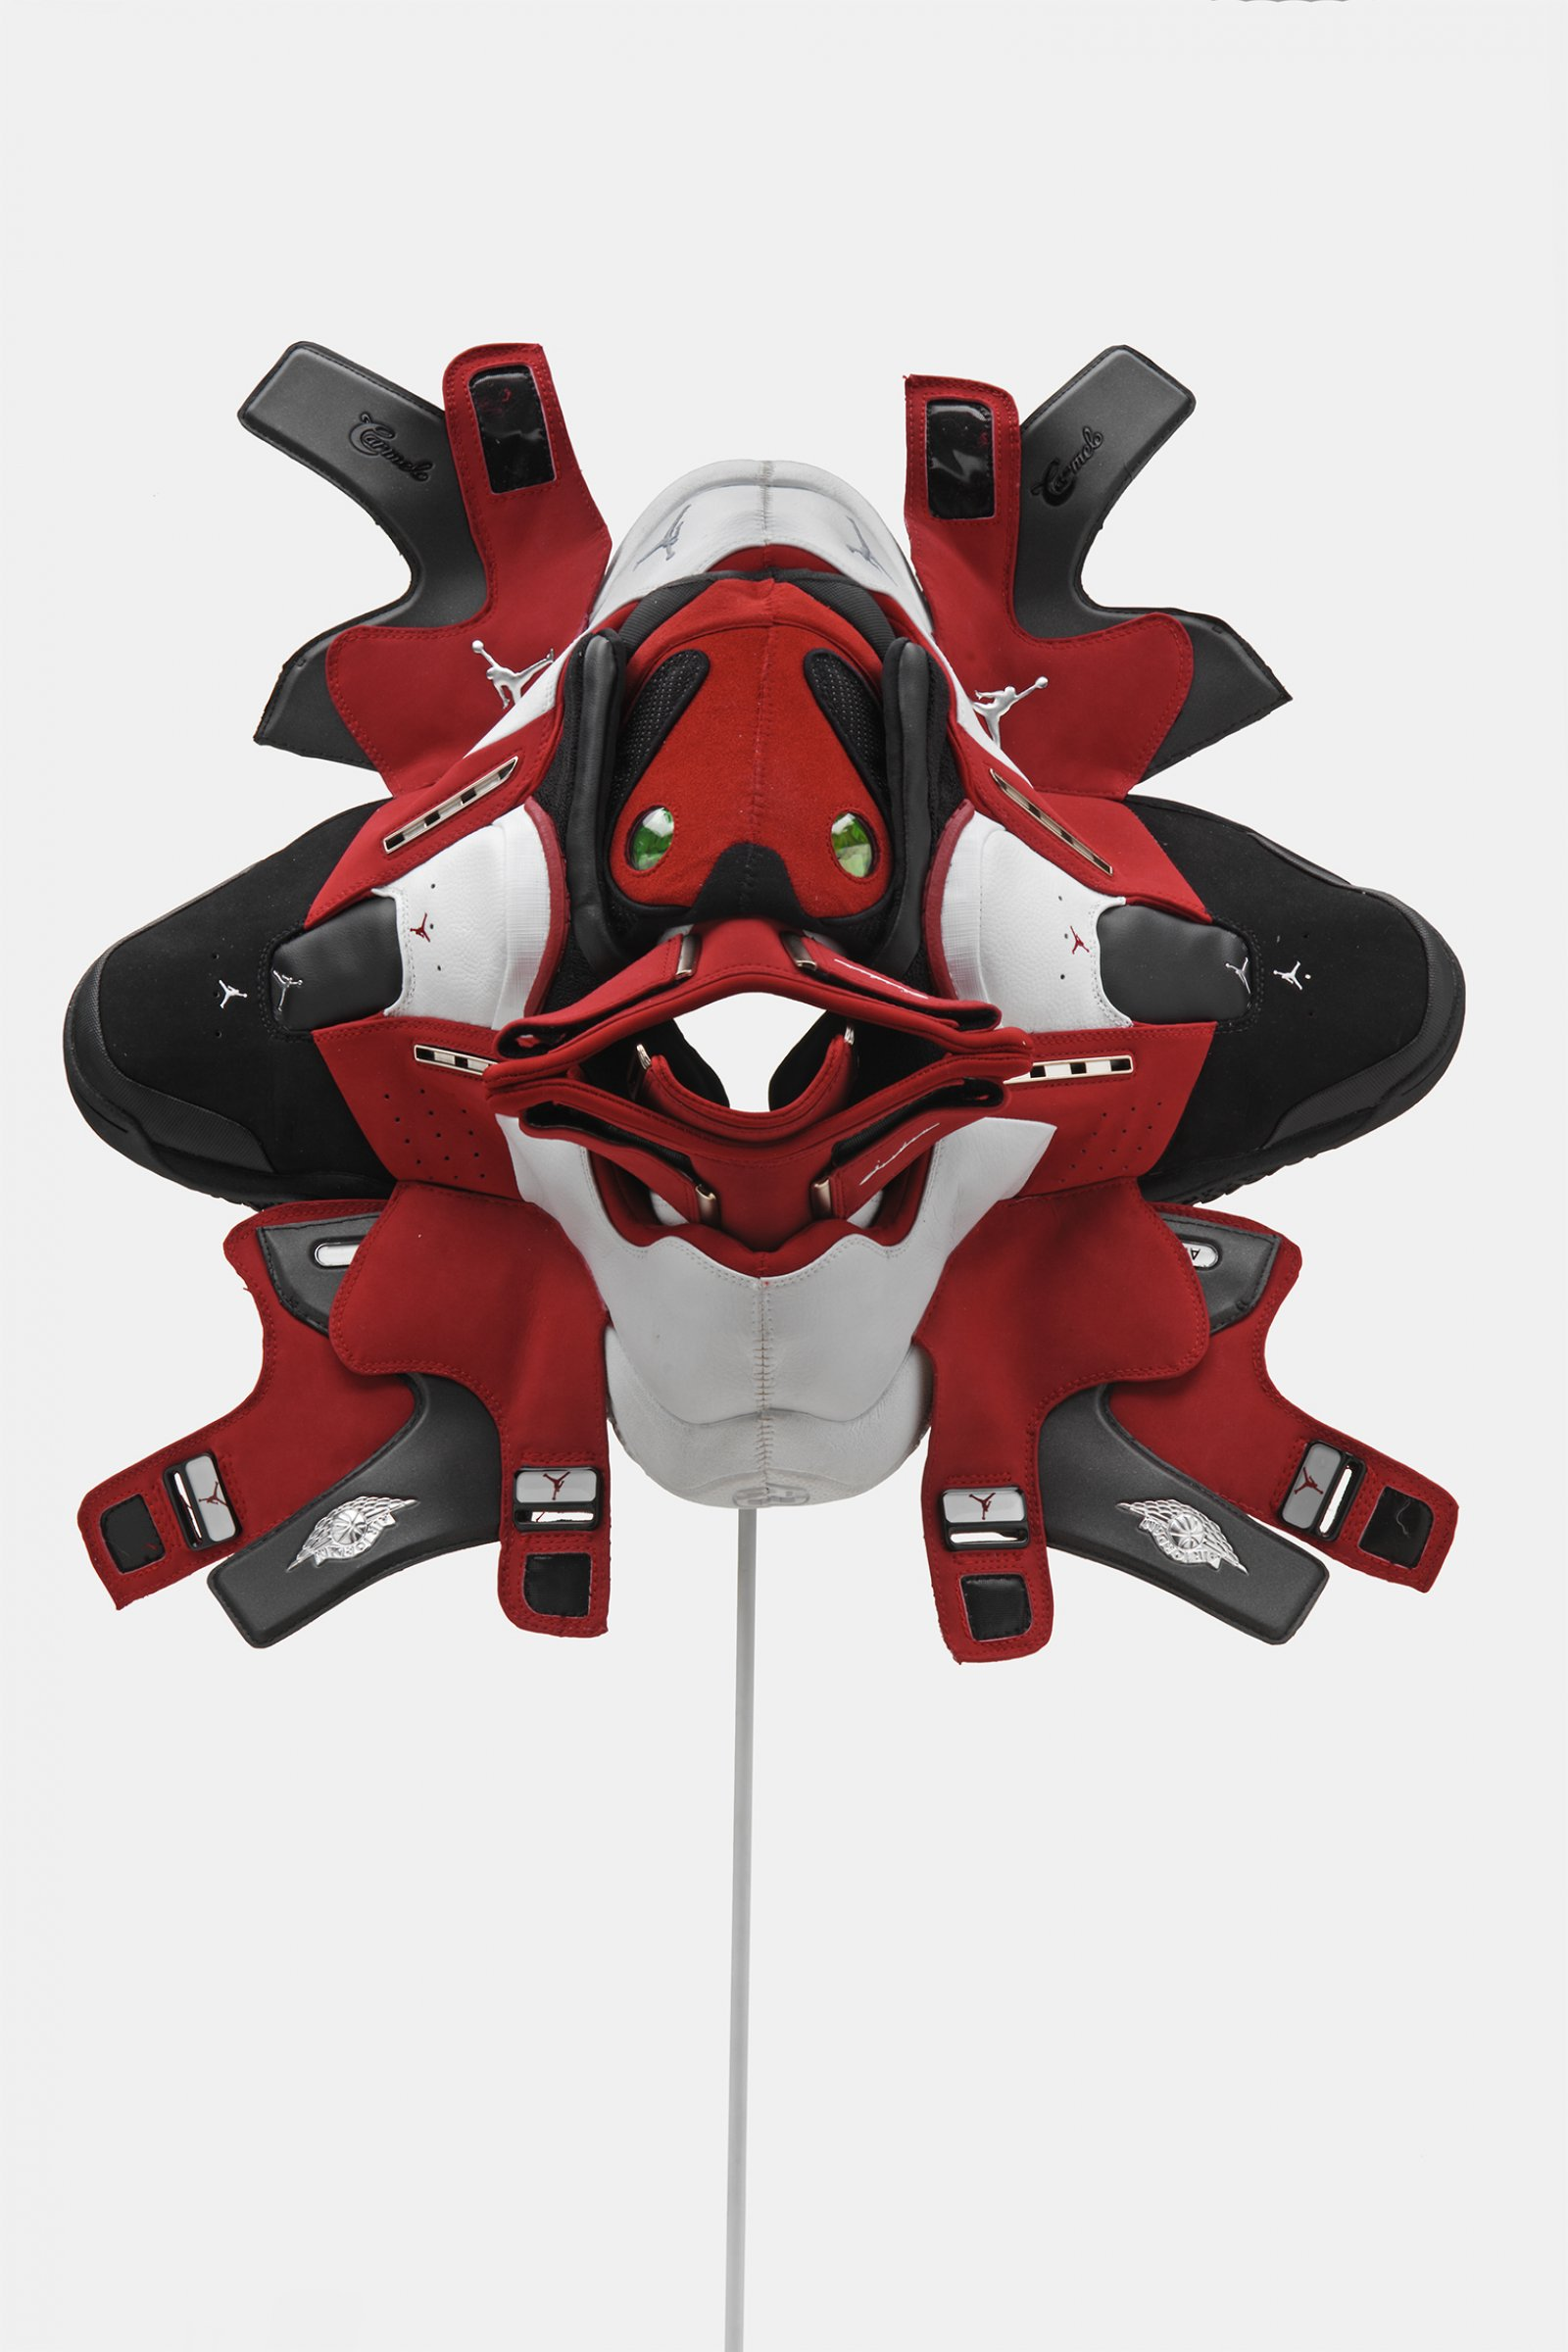 BrianJungen,Prototype for New Understanding #22, 2005, nike air jordans, human hair,19 x 20 x 8 in. (49 x 51 x 21cm)